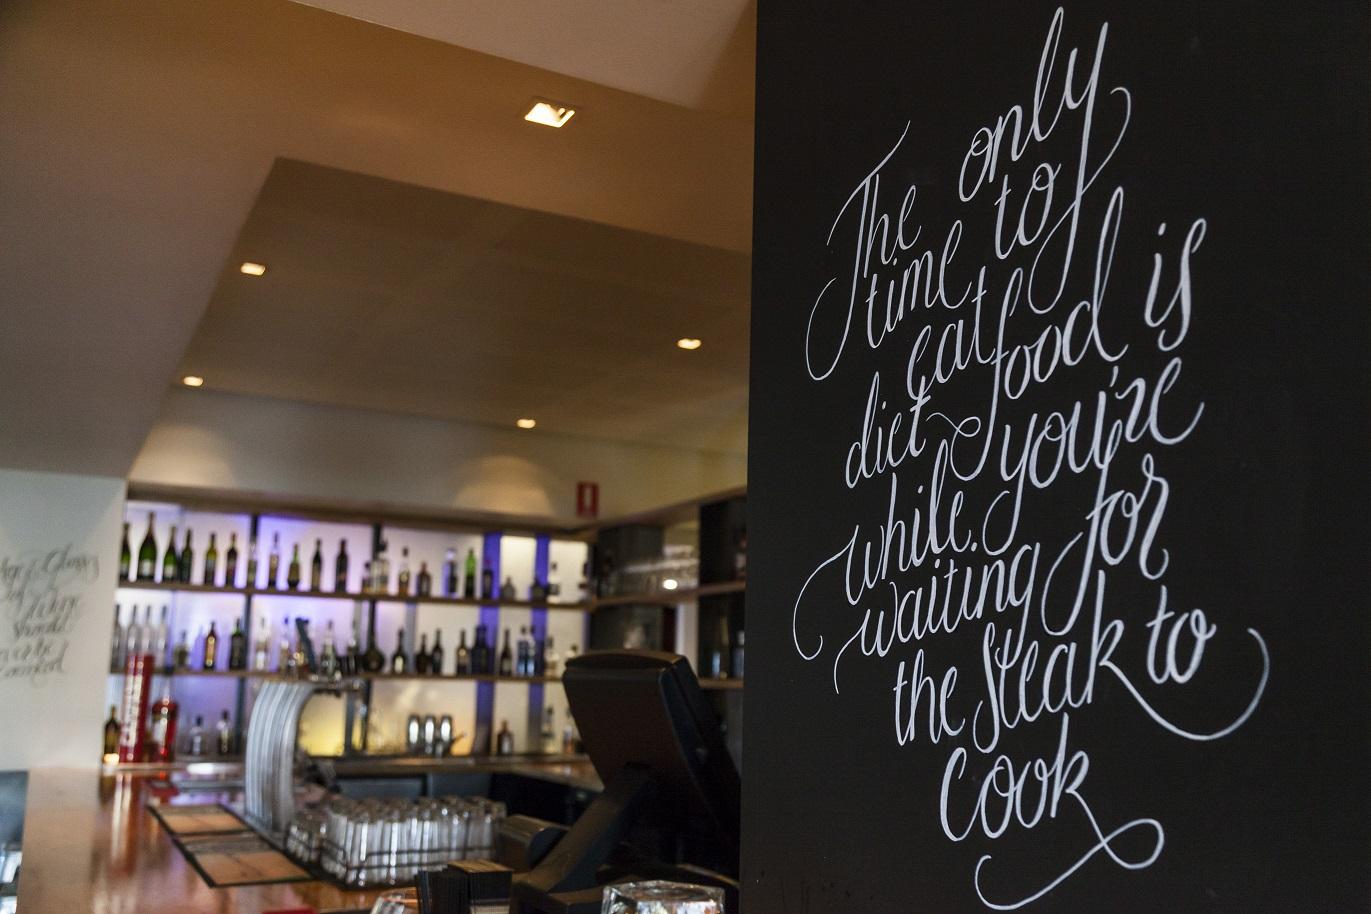 Cocktail Bar Slogan.jpg